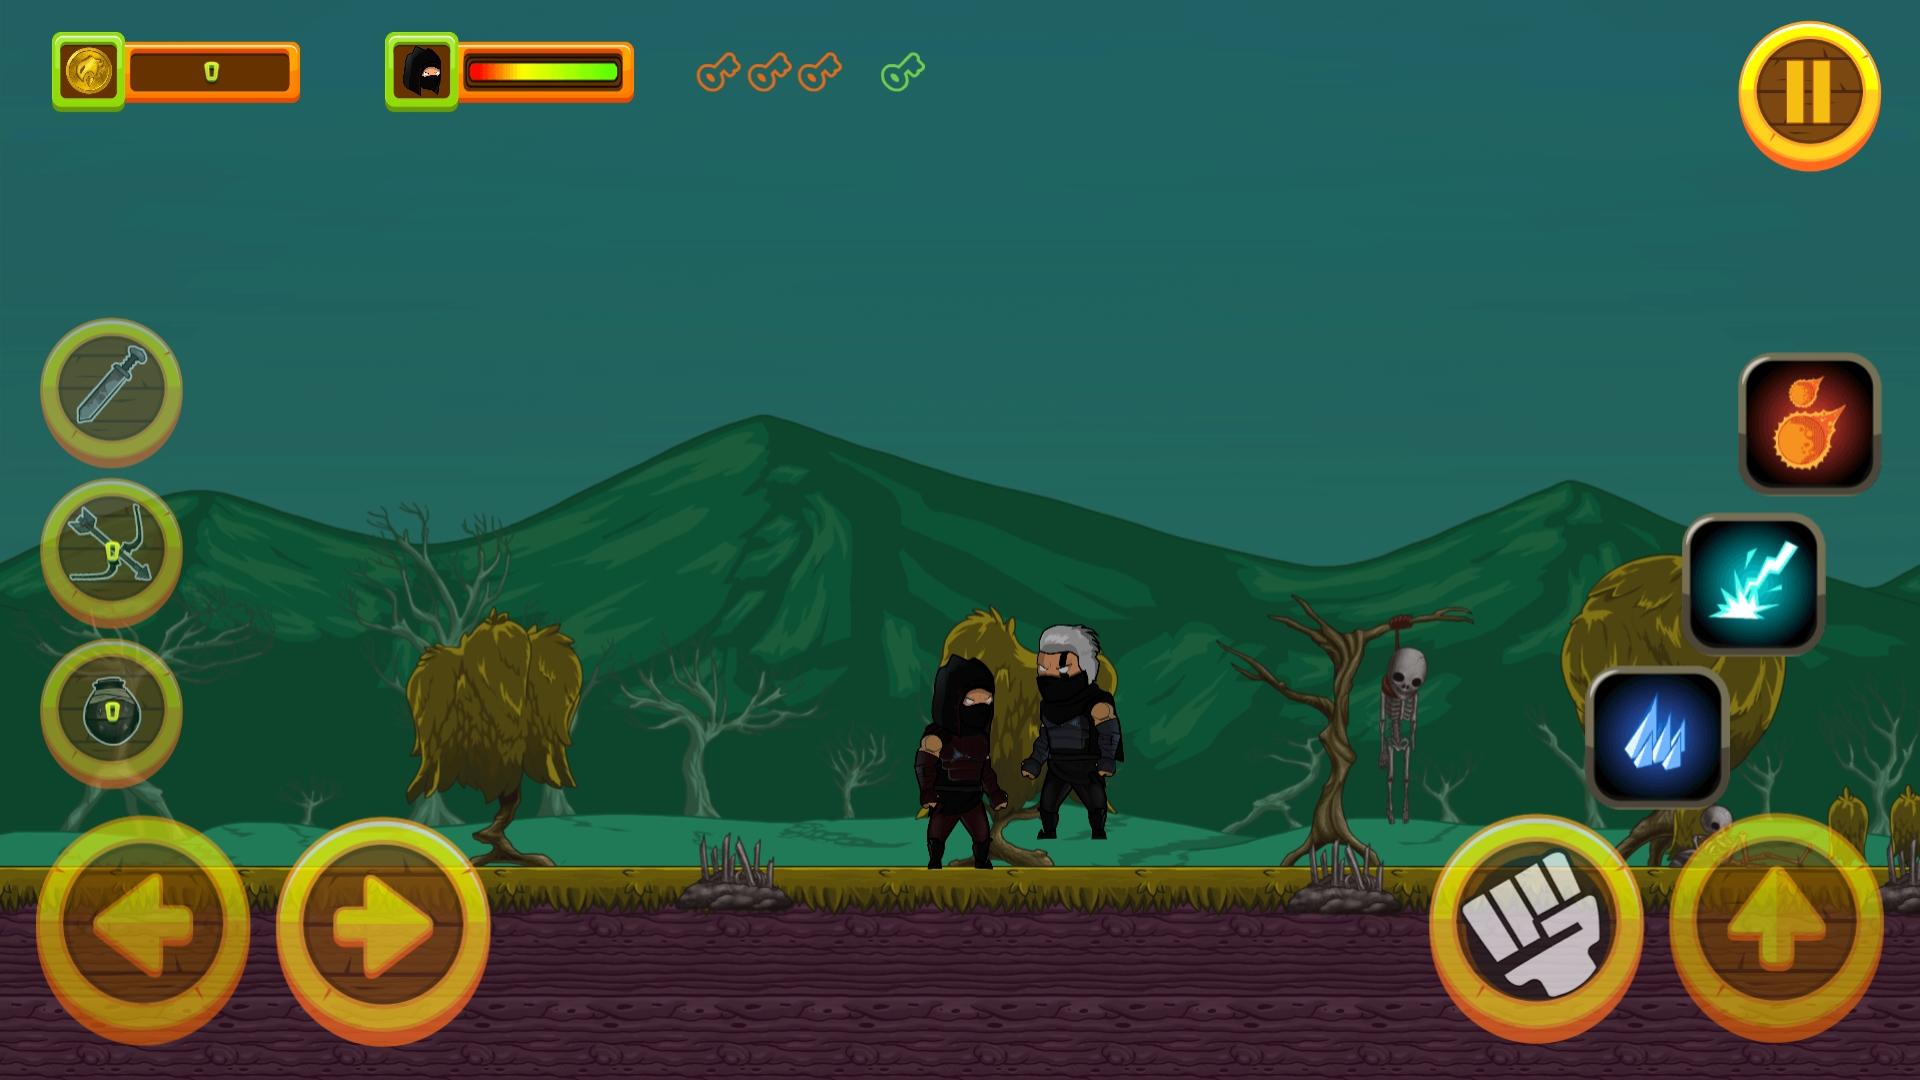 Black Assassin - HTML5 Game + Mobile Version (Construct 3 / C3P) - 6